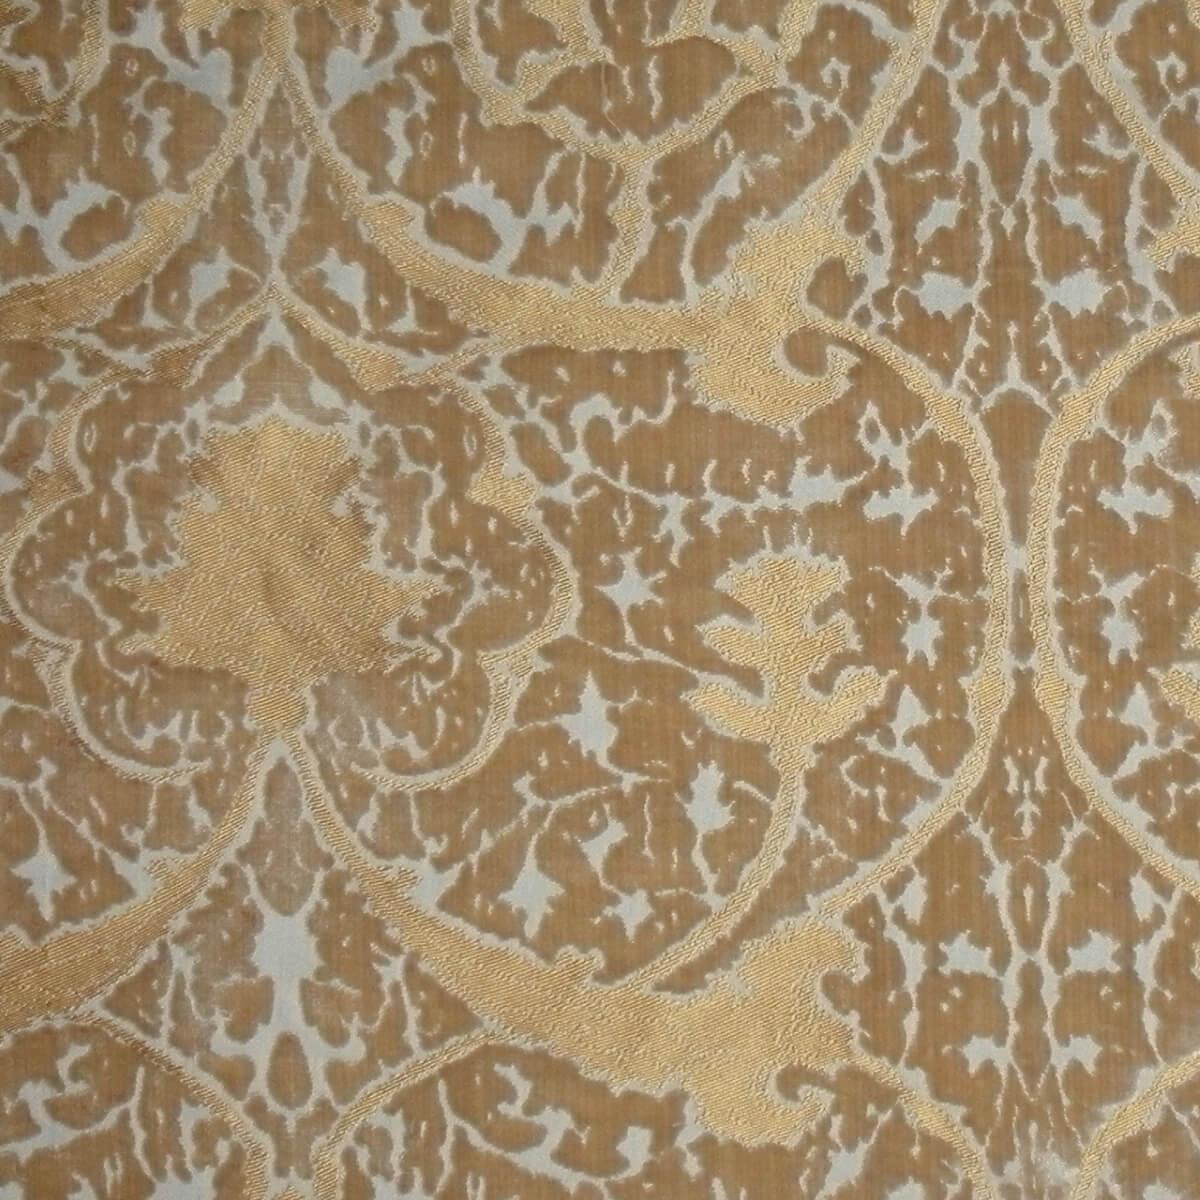 Velluto bacchetta Gotico 332-3945S avorio | Tessiture Bevilacqua